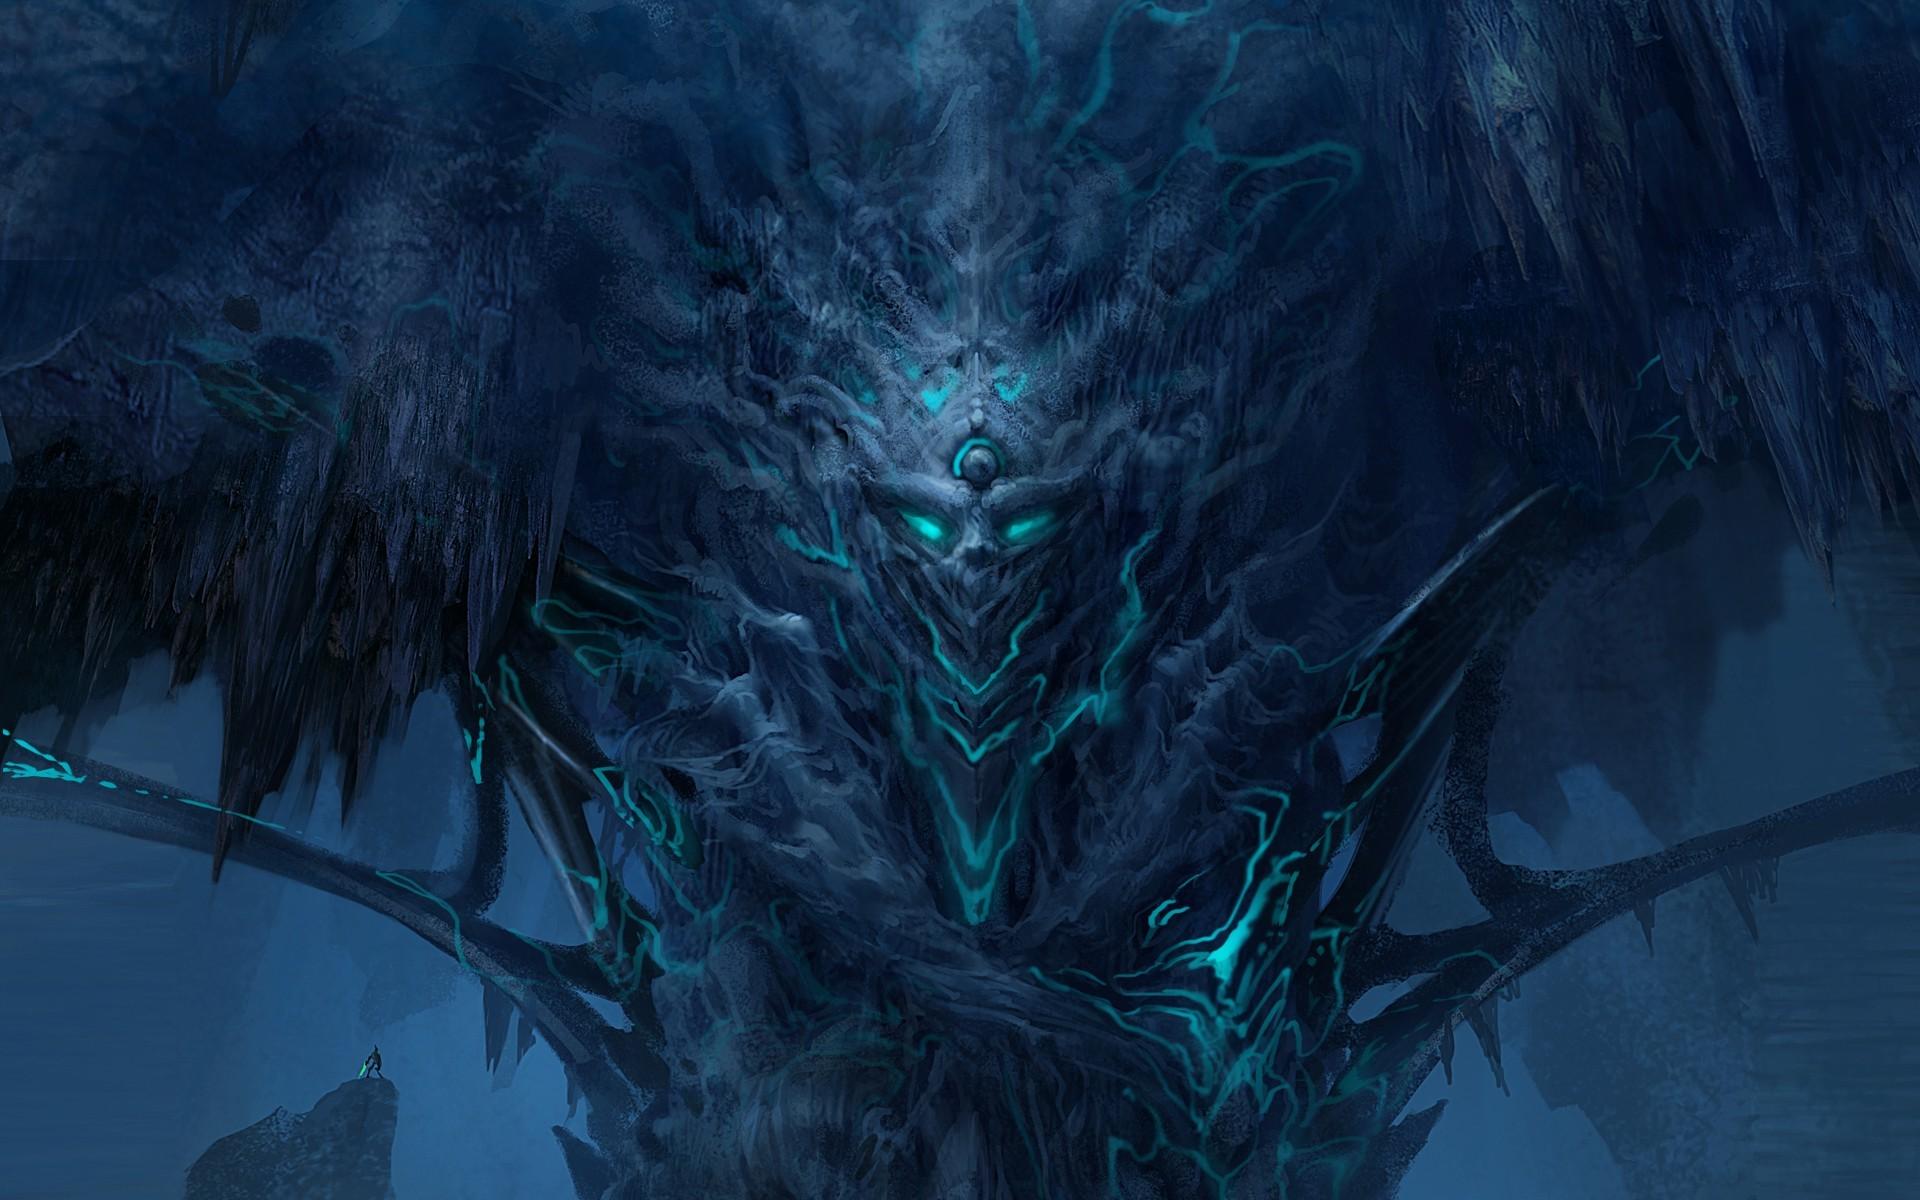 download StarCraft Starcraft II Protoss Wallpapers HD Desktop 1920x1200